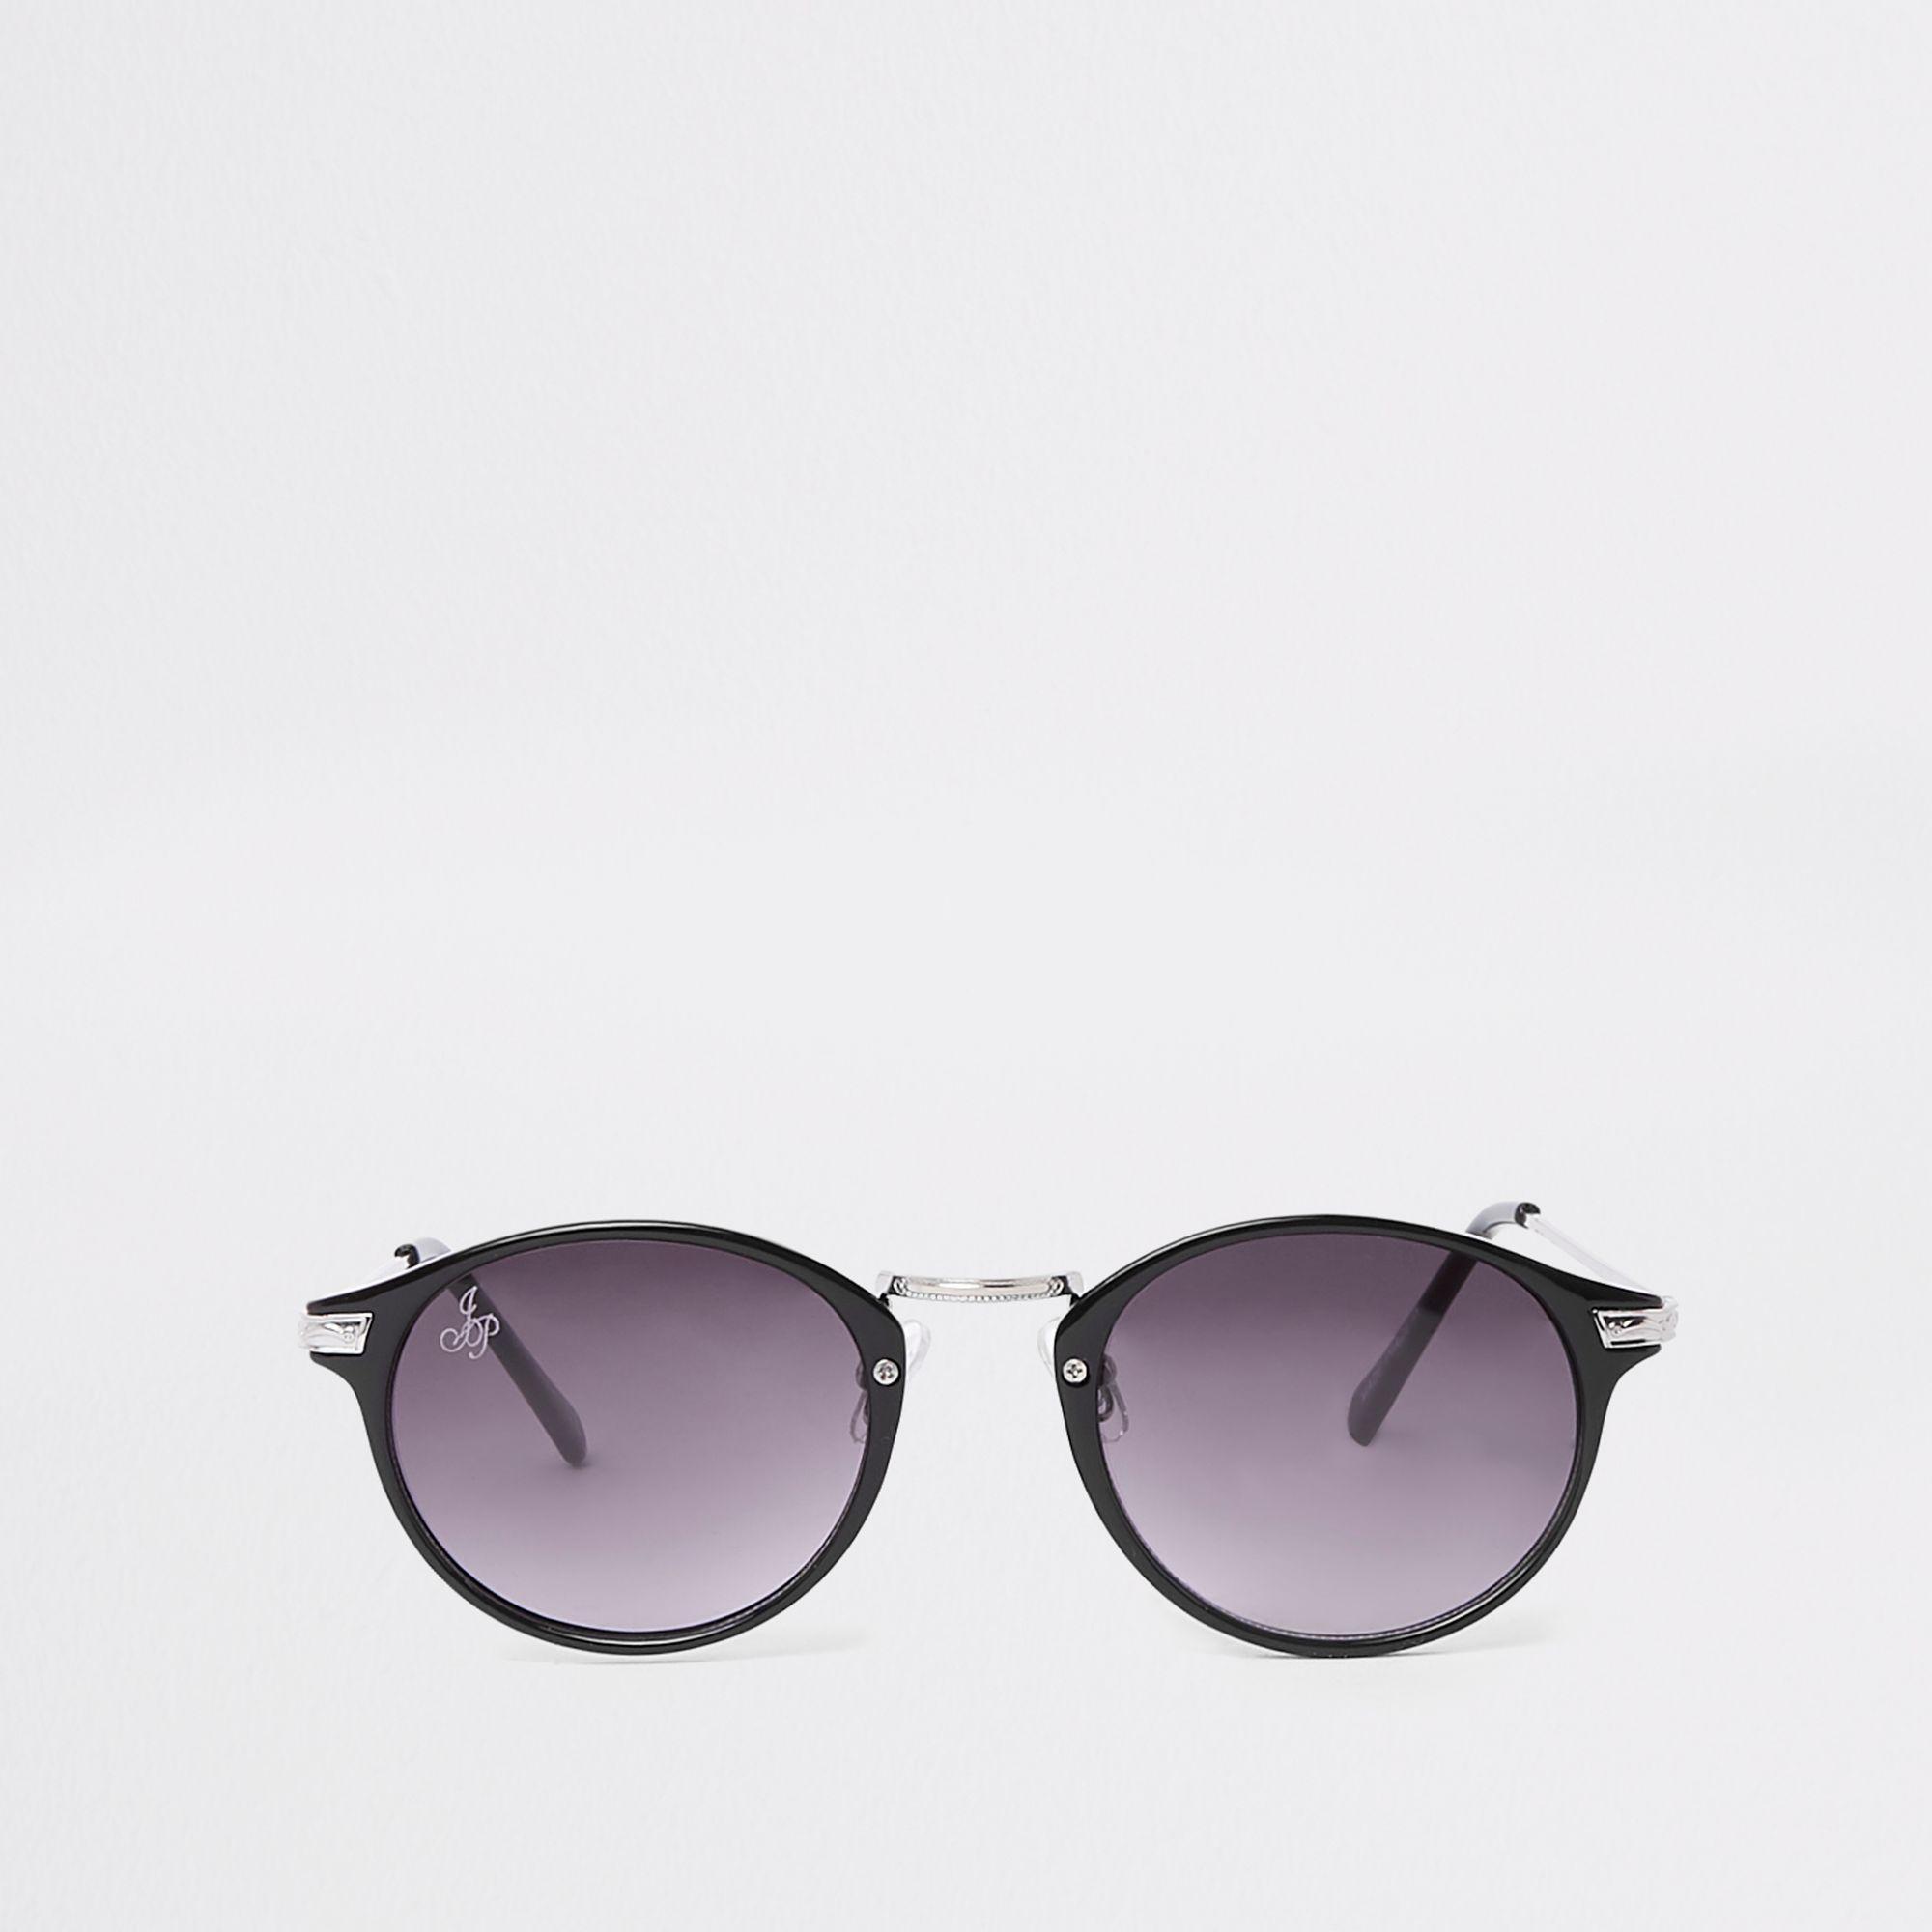 1e1f1f3e0fa9 River Island Jeepers Peepers Round Sunglasses in Black for Men - Lyst